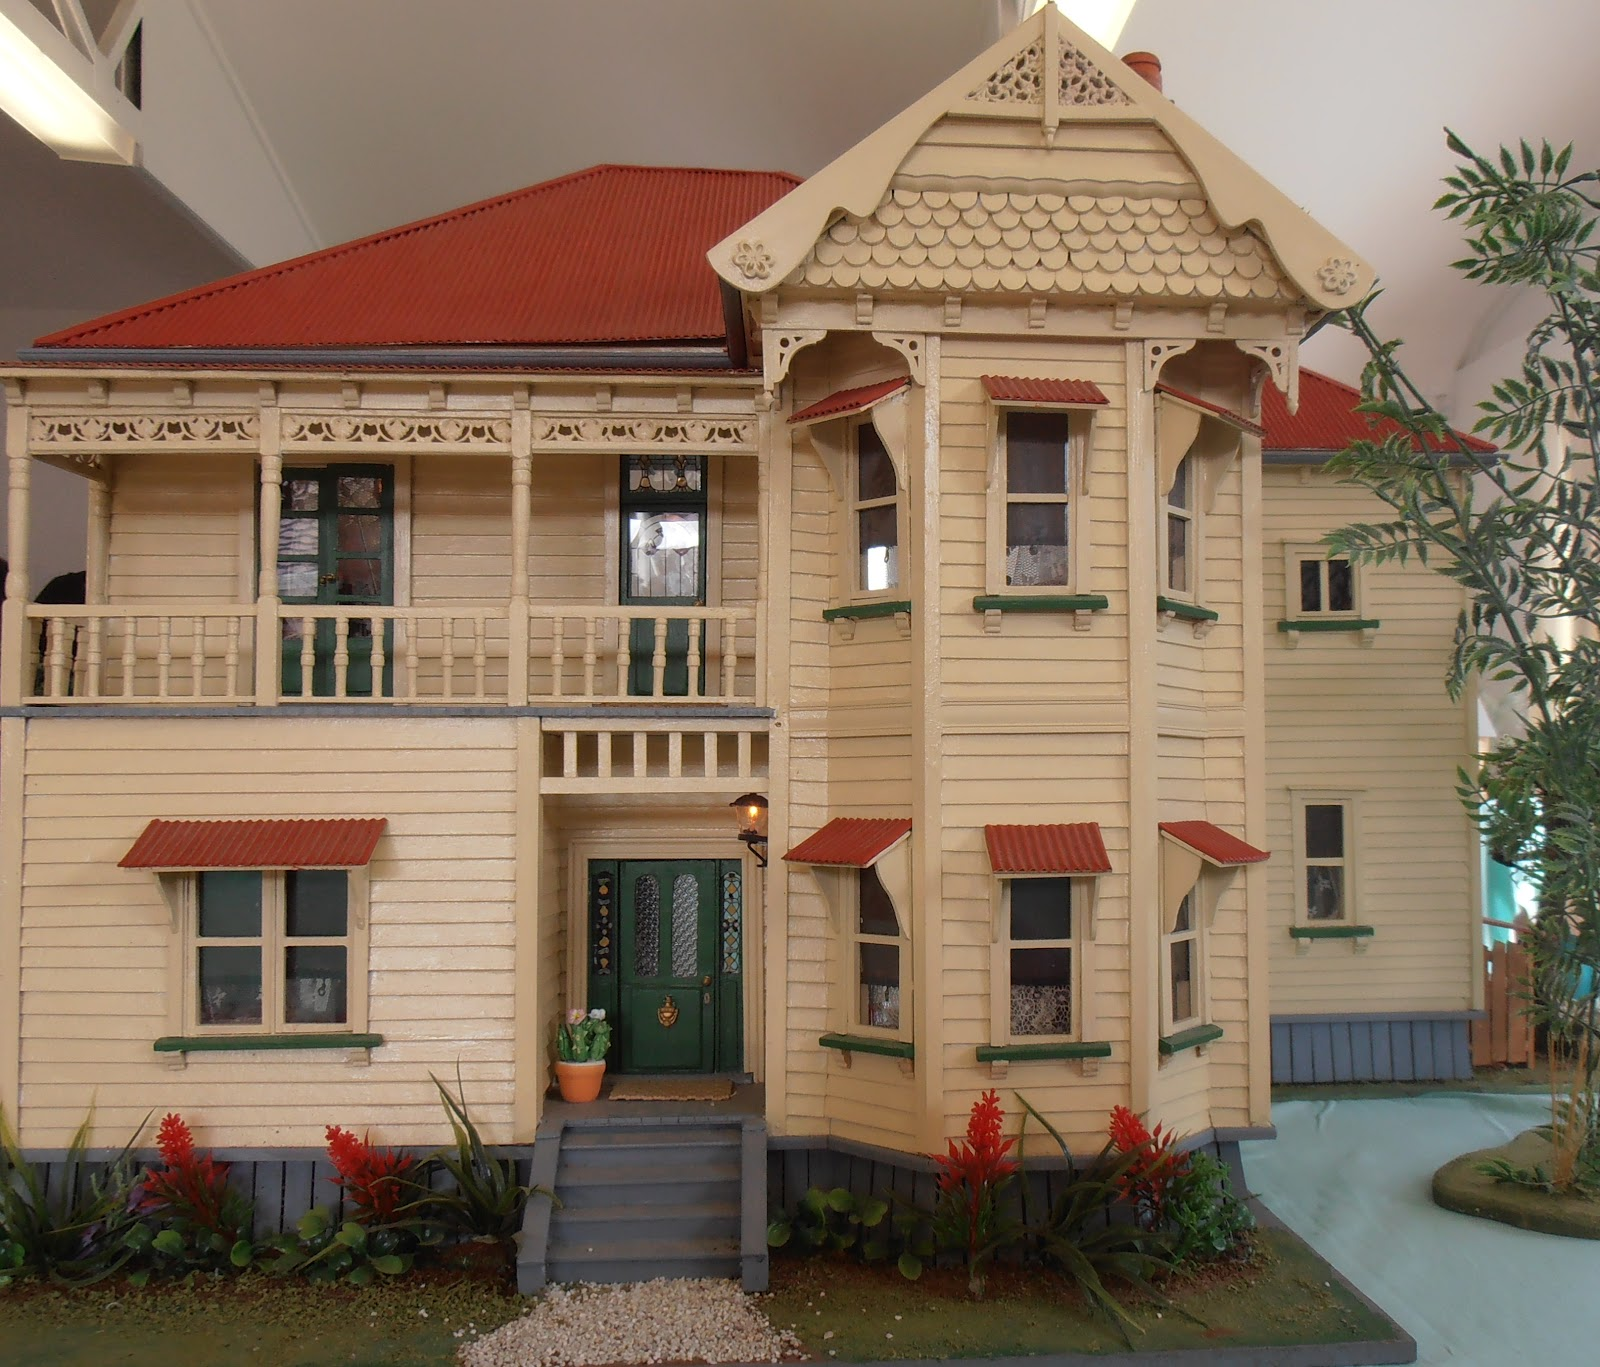 Kitset Doll House Christmas Doll House Diy Kit Set X Mas